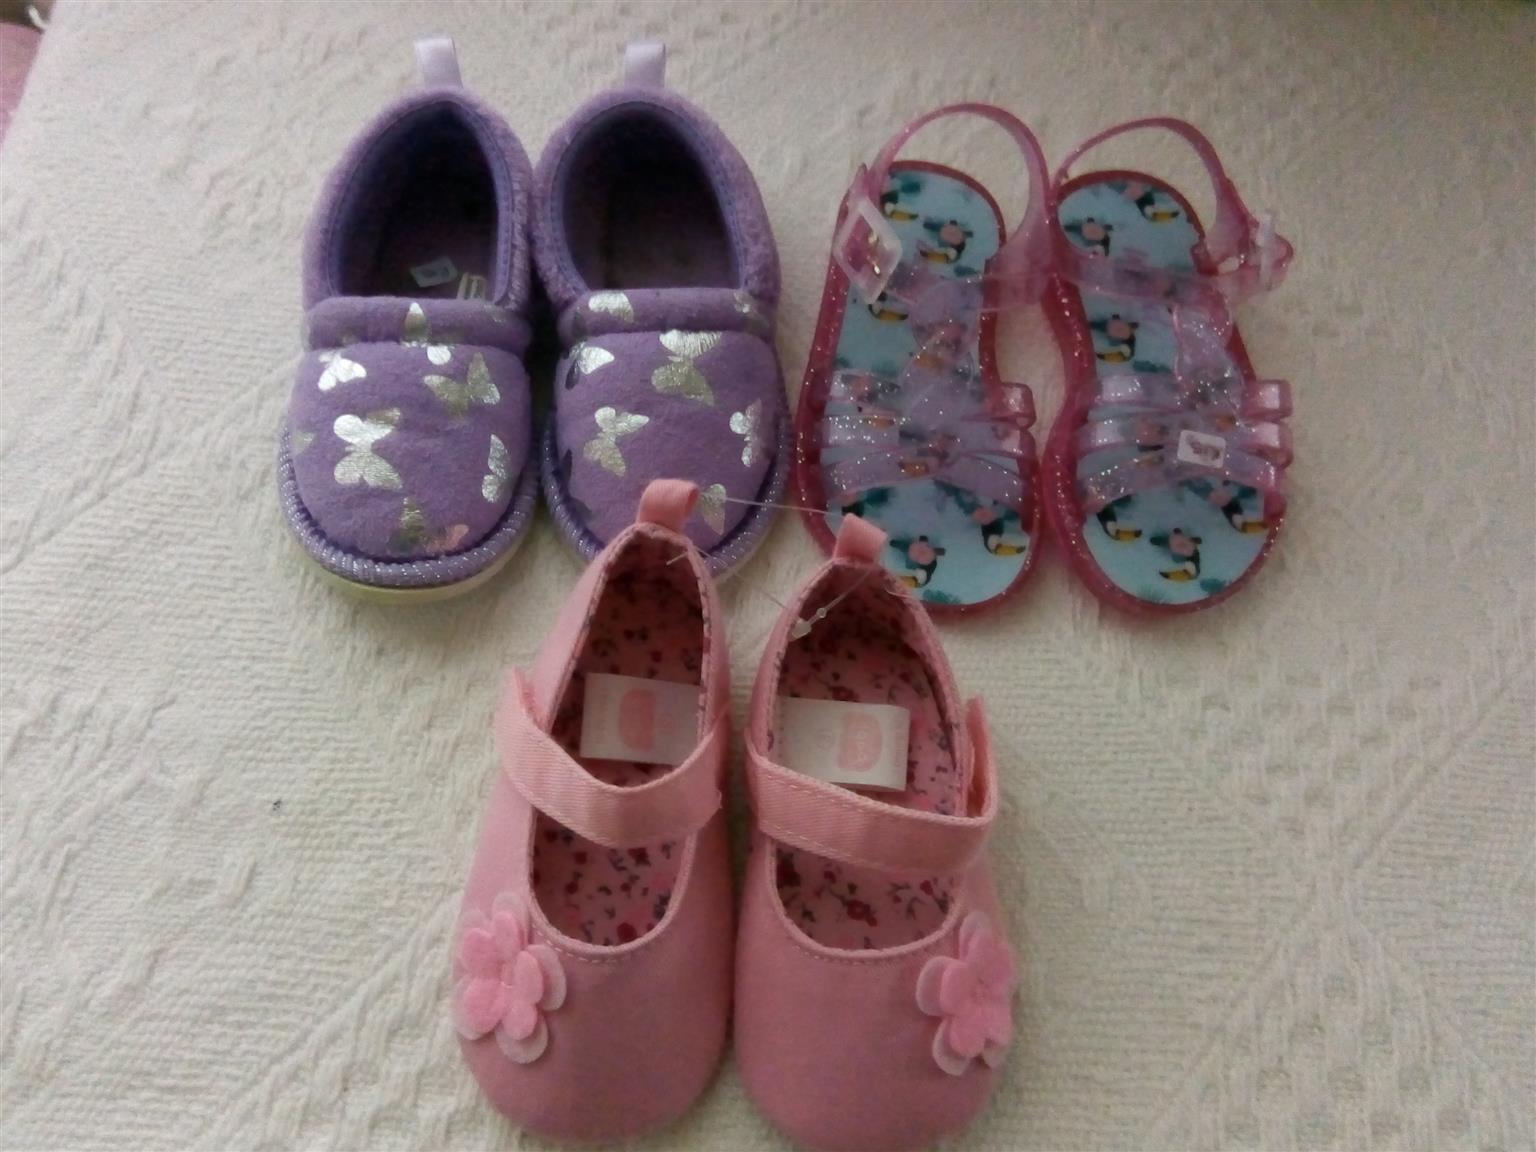 bde2b822e Baby girl clothing and baby stuff